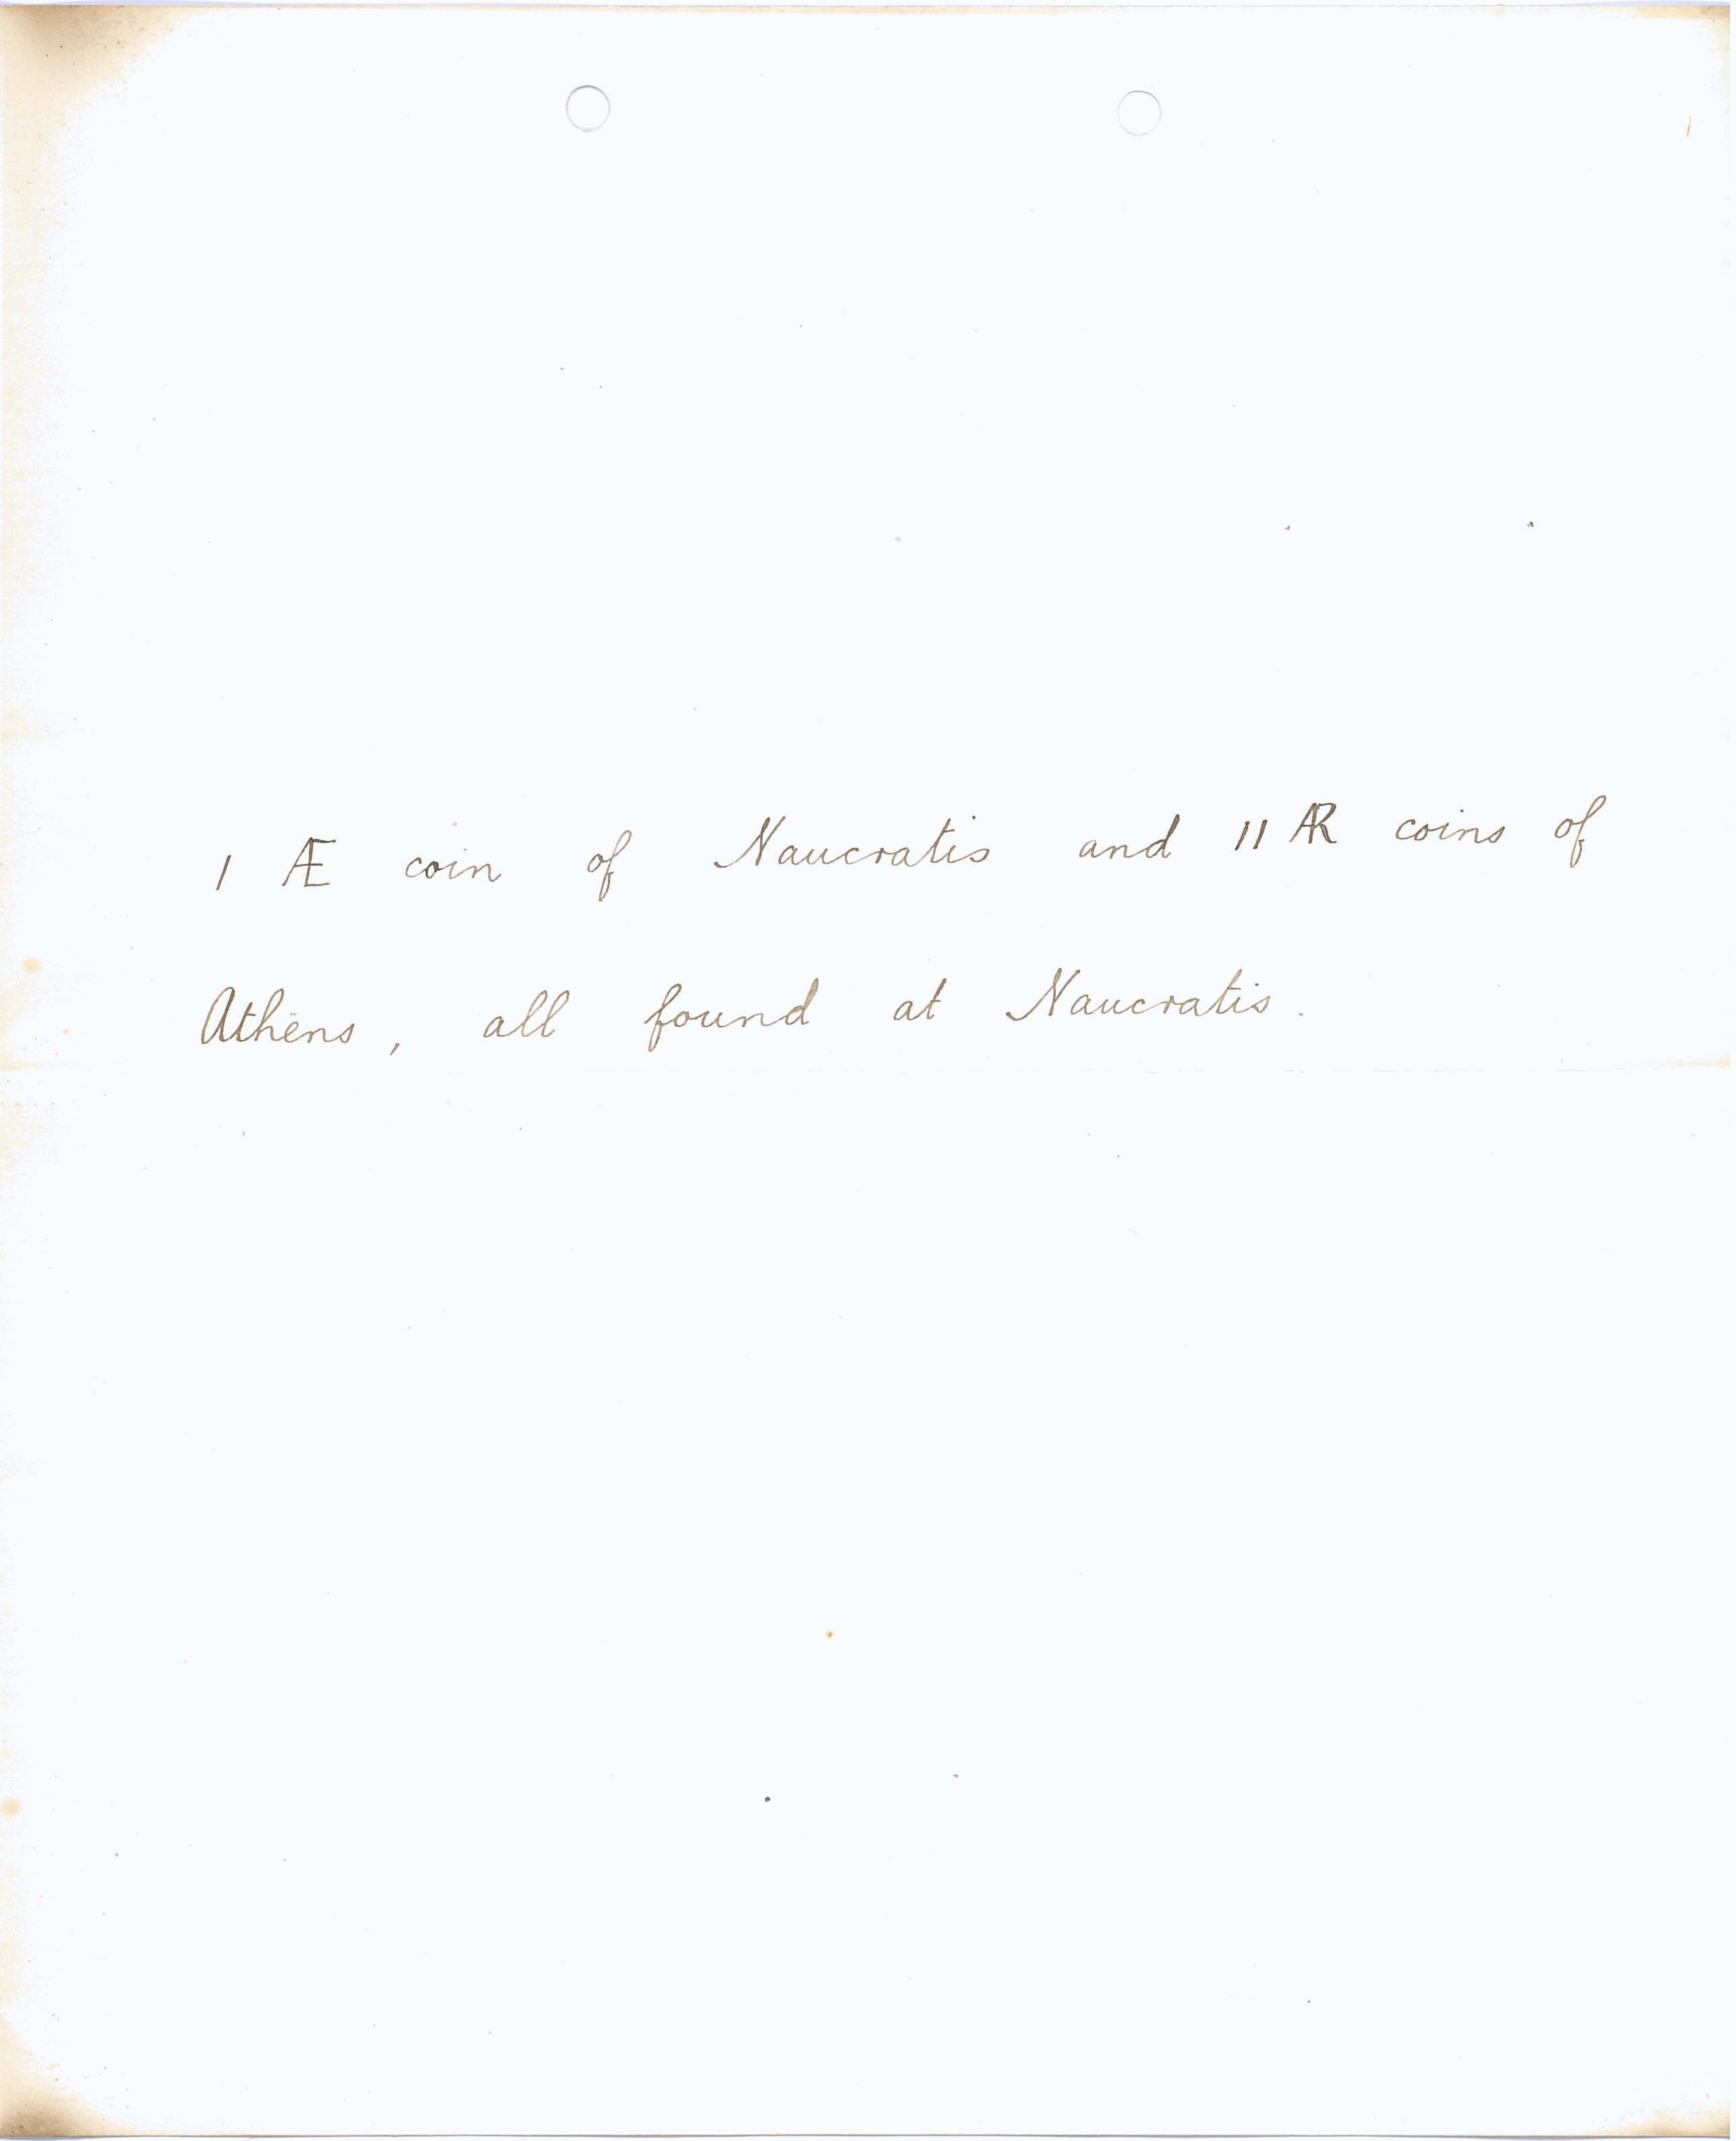 1904-05 Sinai, Deir el-Bahri, Oxyrhynchus, Naukratis DIST.23.02b